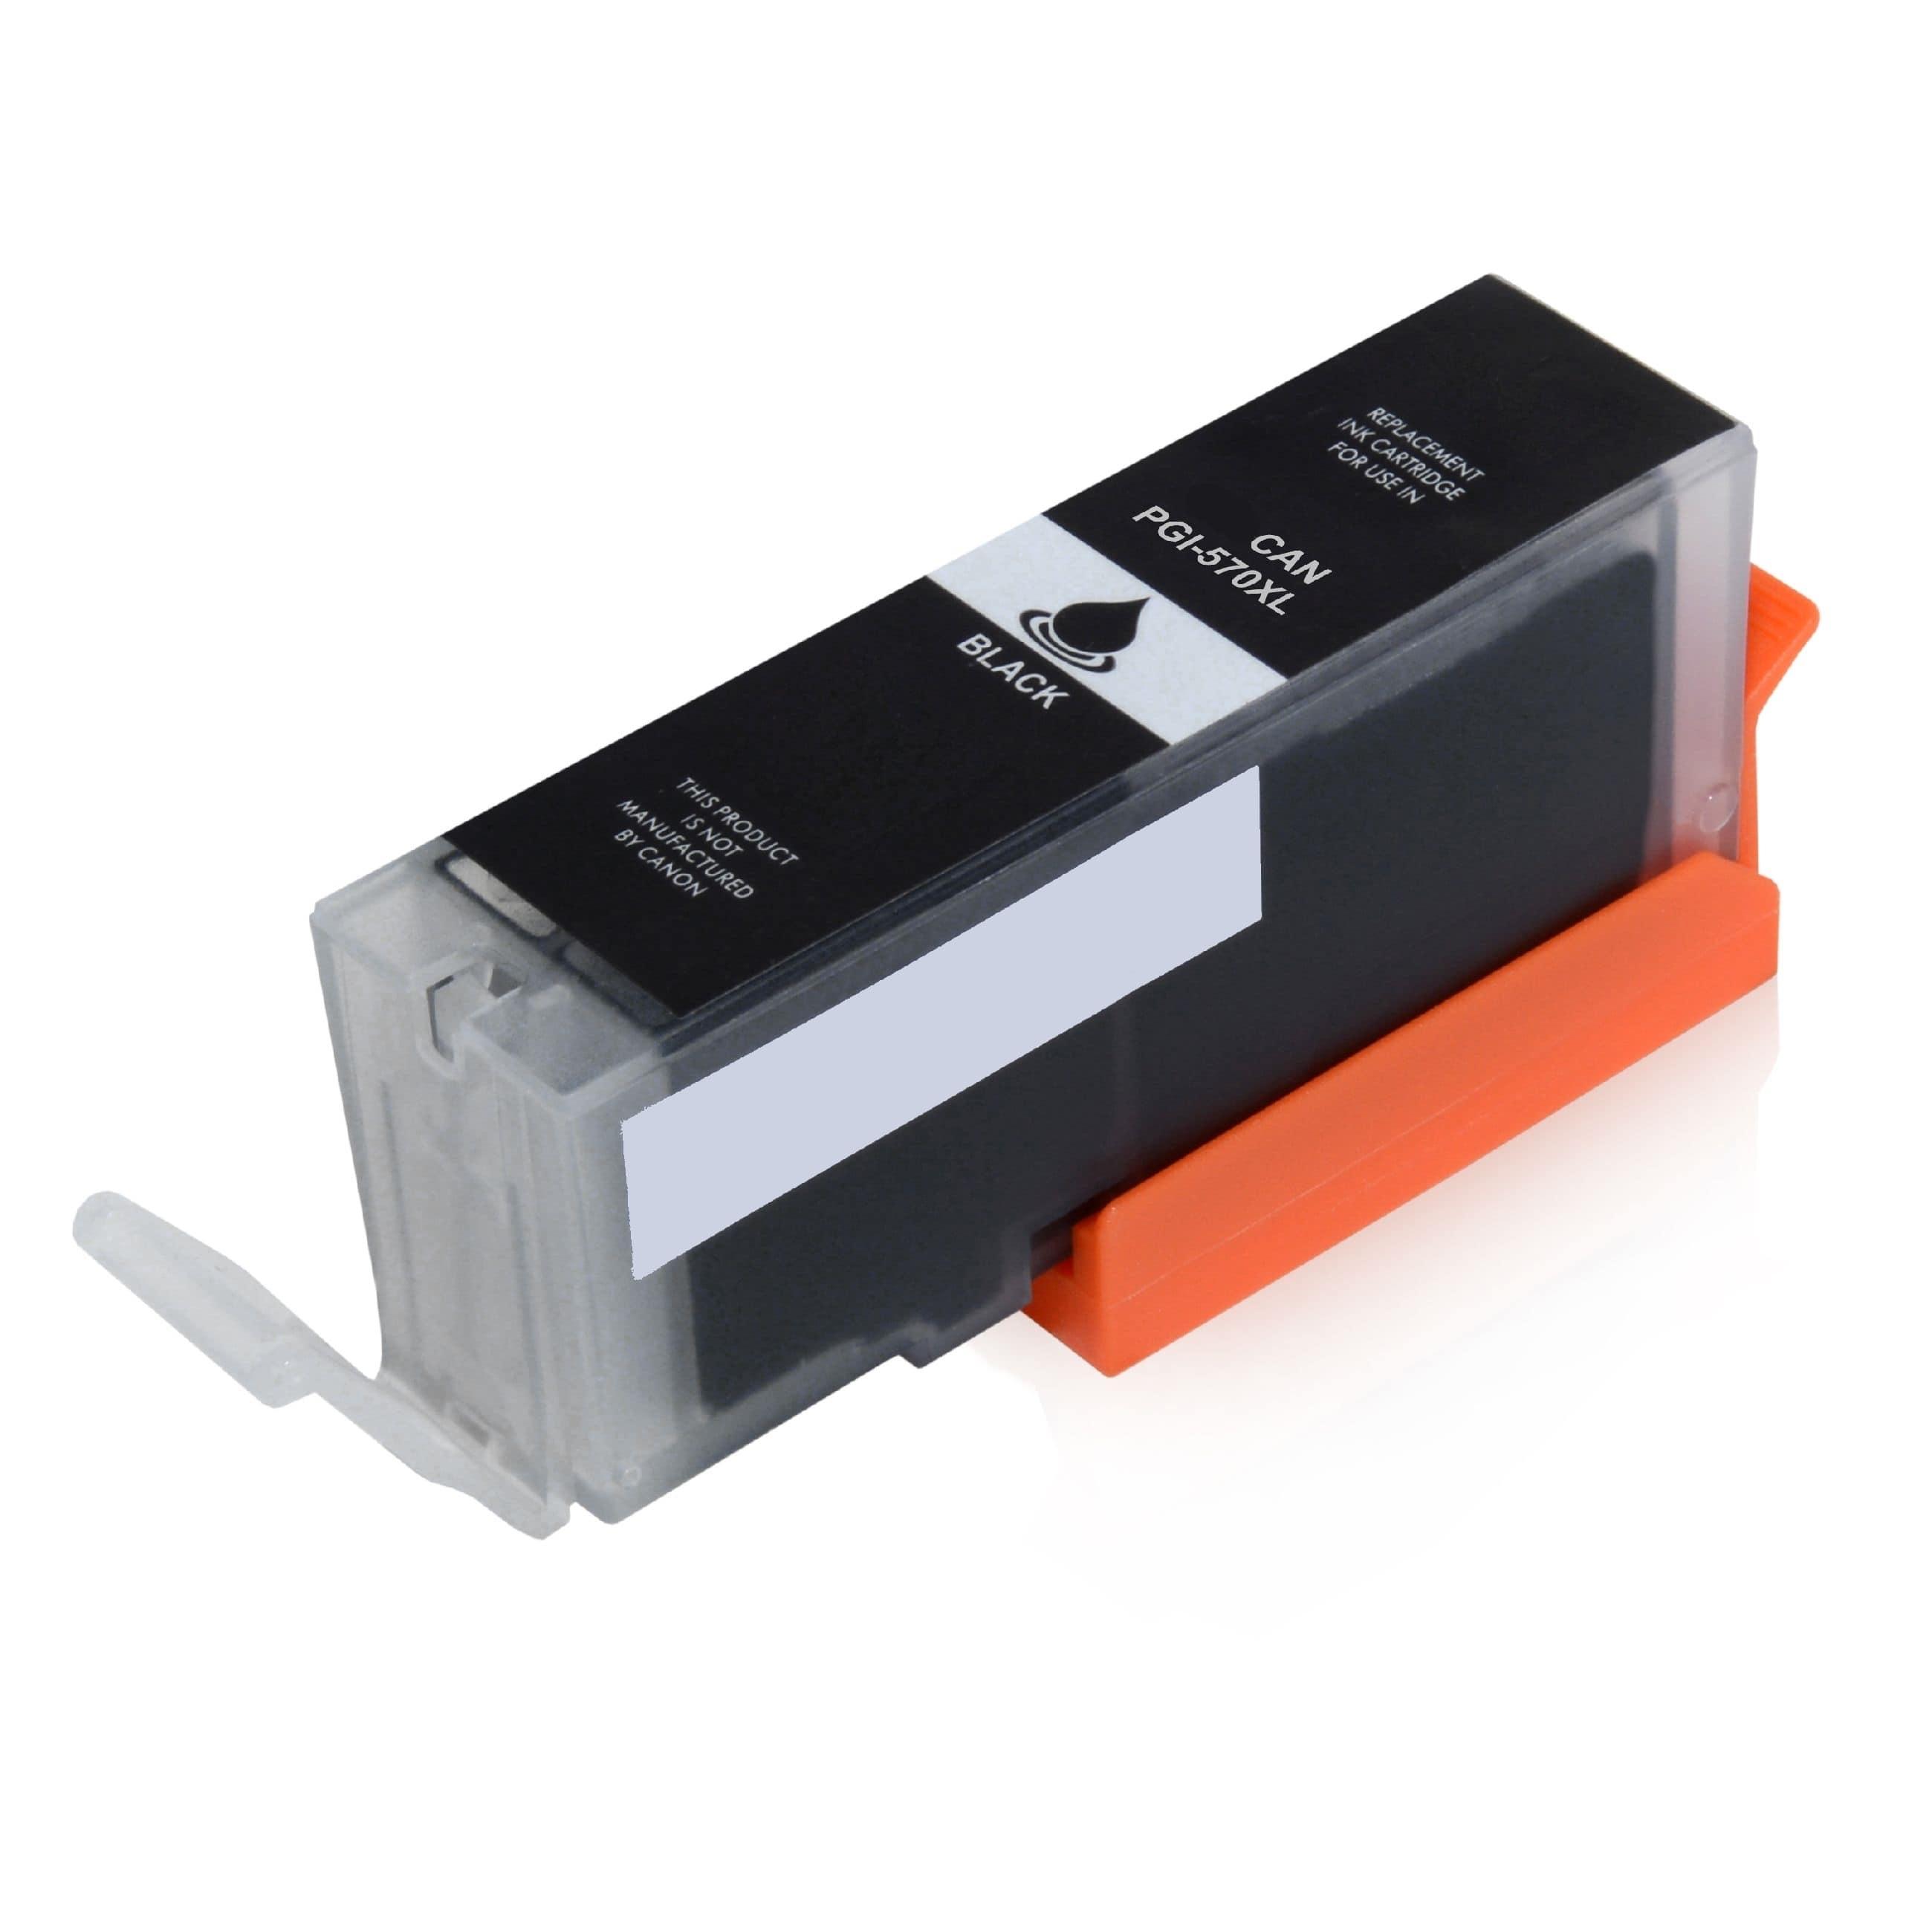 ASC-Premium-Tintenpatrone für Canon Pixma MG 5750 schwarz Pixma MG 5750 PixmaMG5750